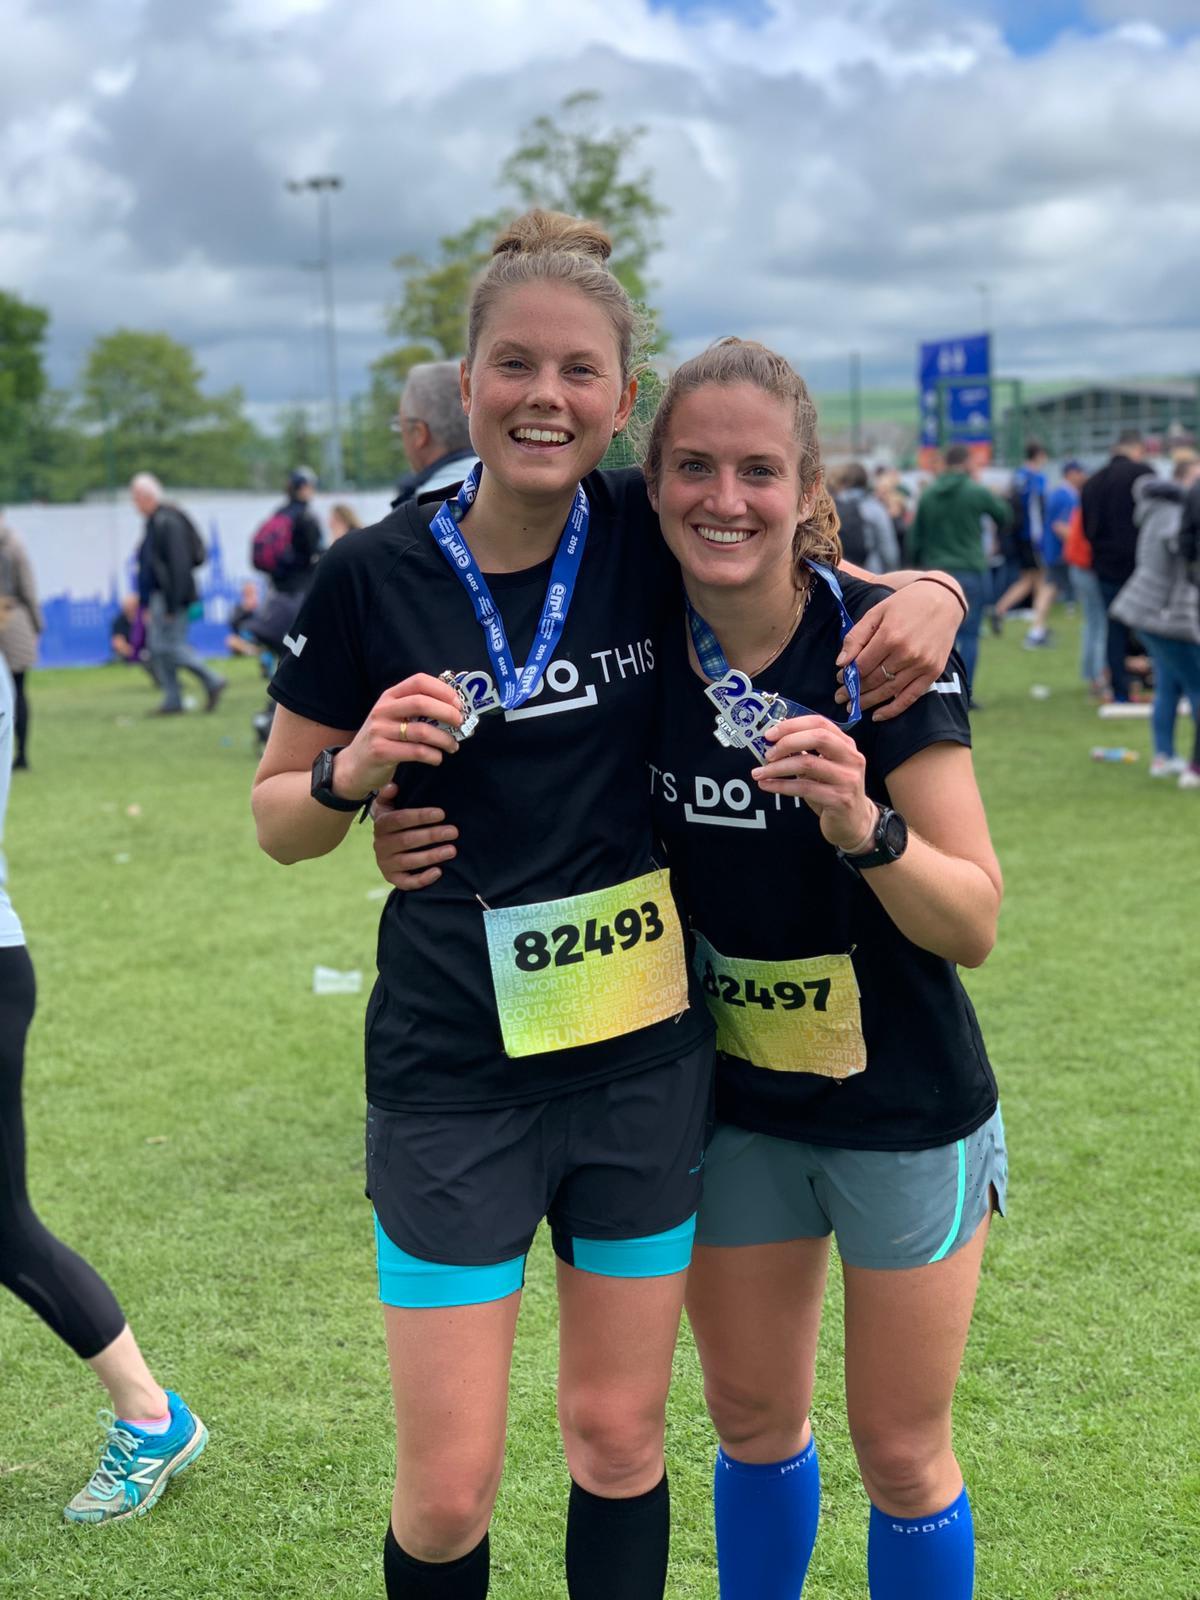 Edinburgh Marathon Festival - 10k, 5k, and Kids Races